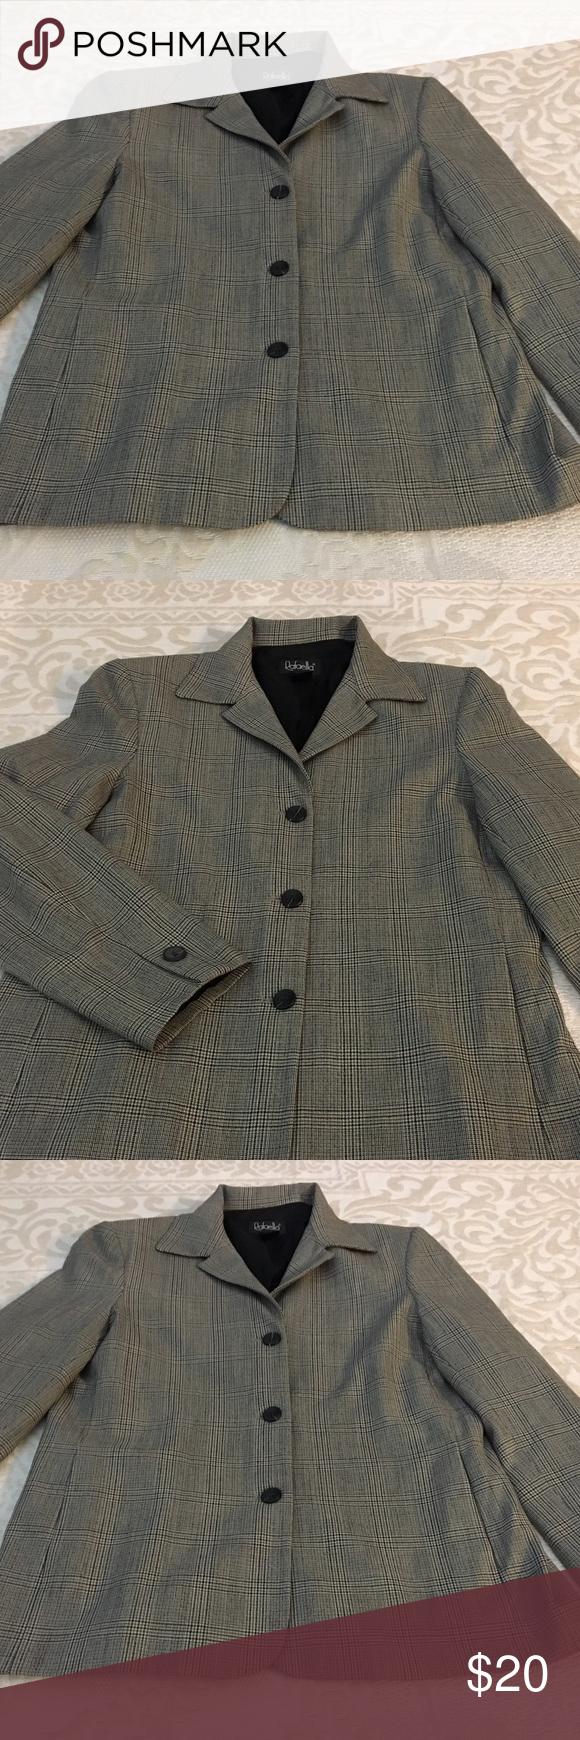 Rafaella Blazer Rafaella Blazer Rafaella Jackets & Coats Blazers